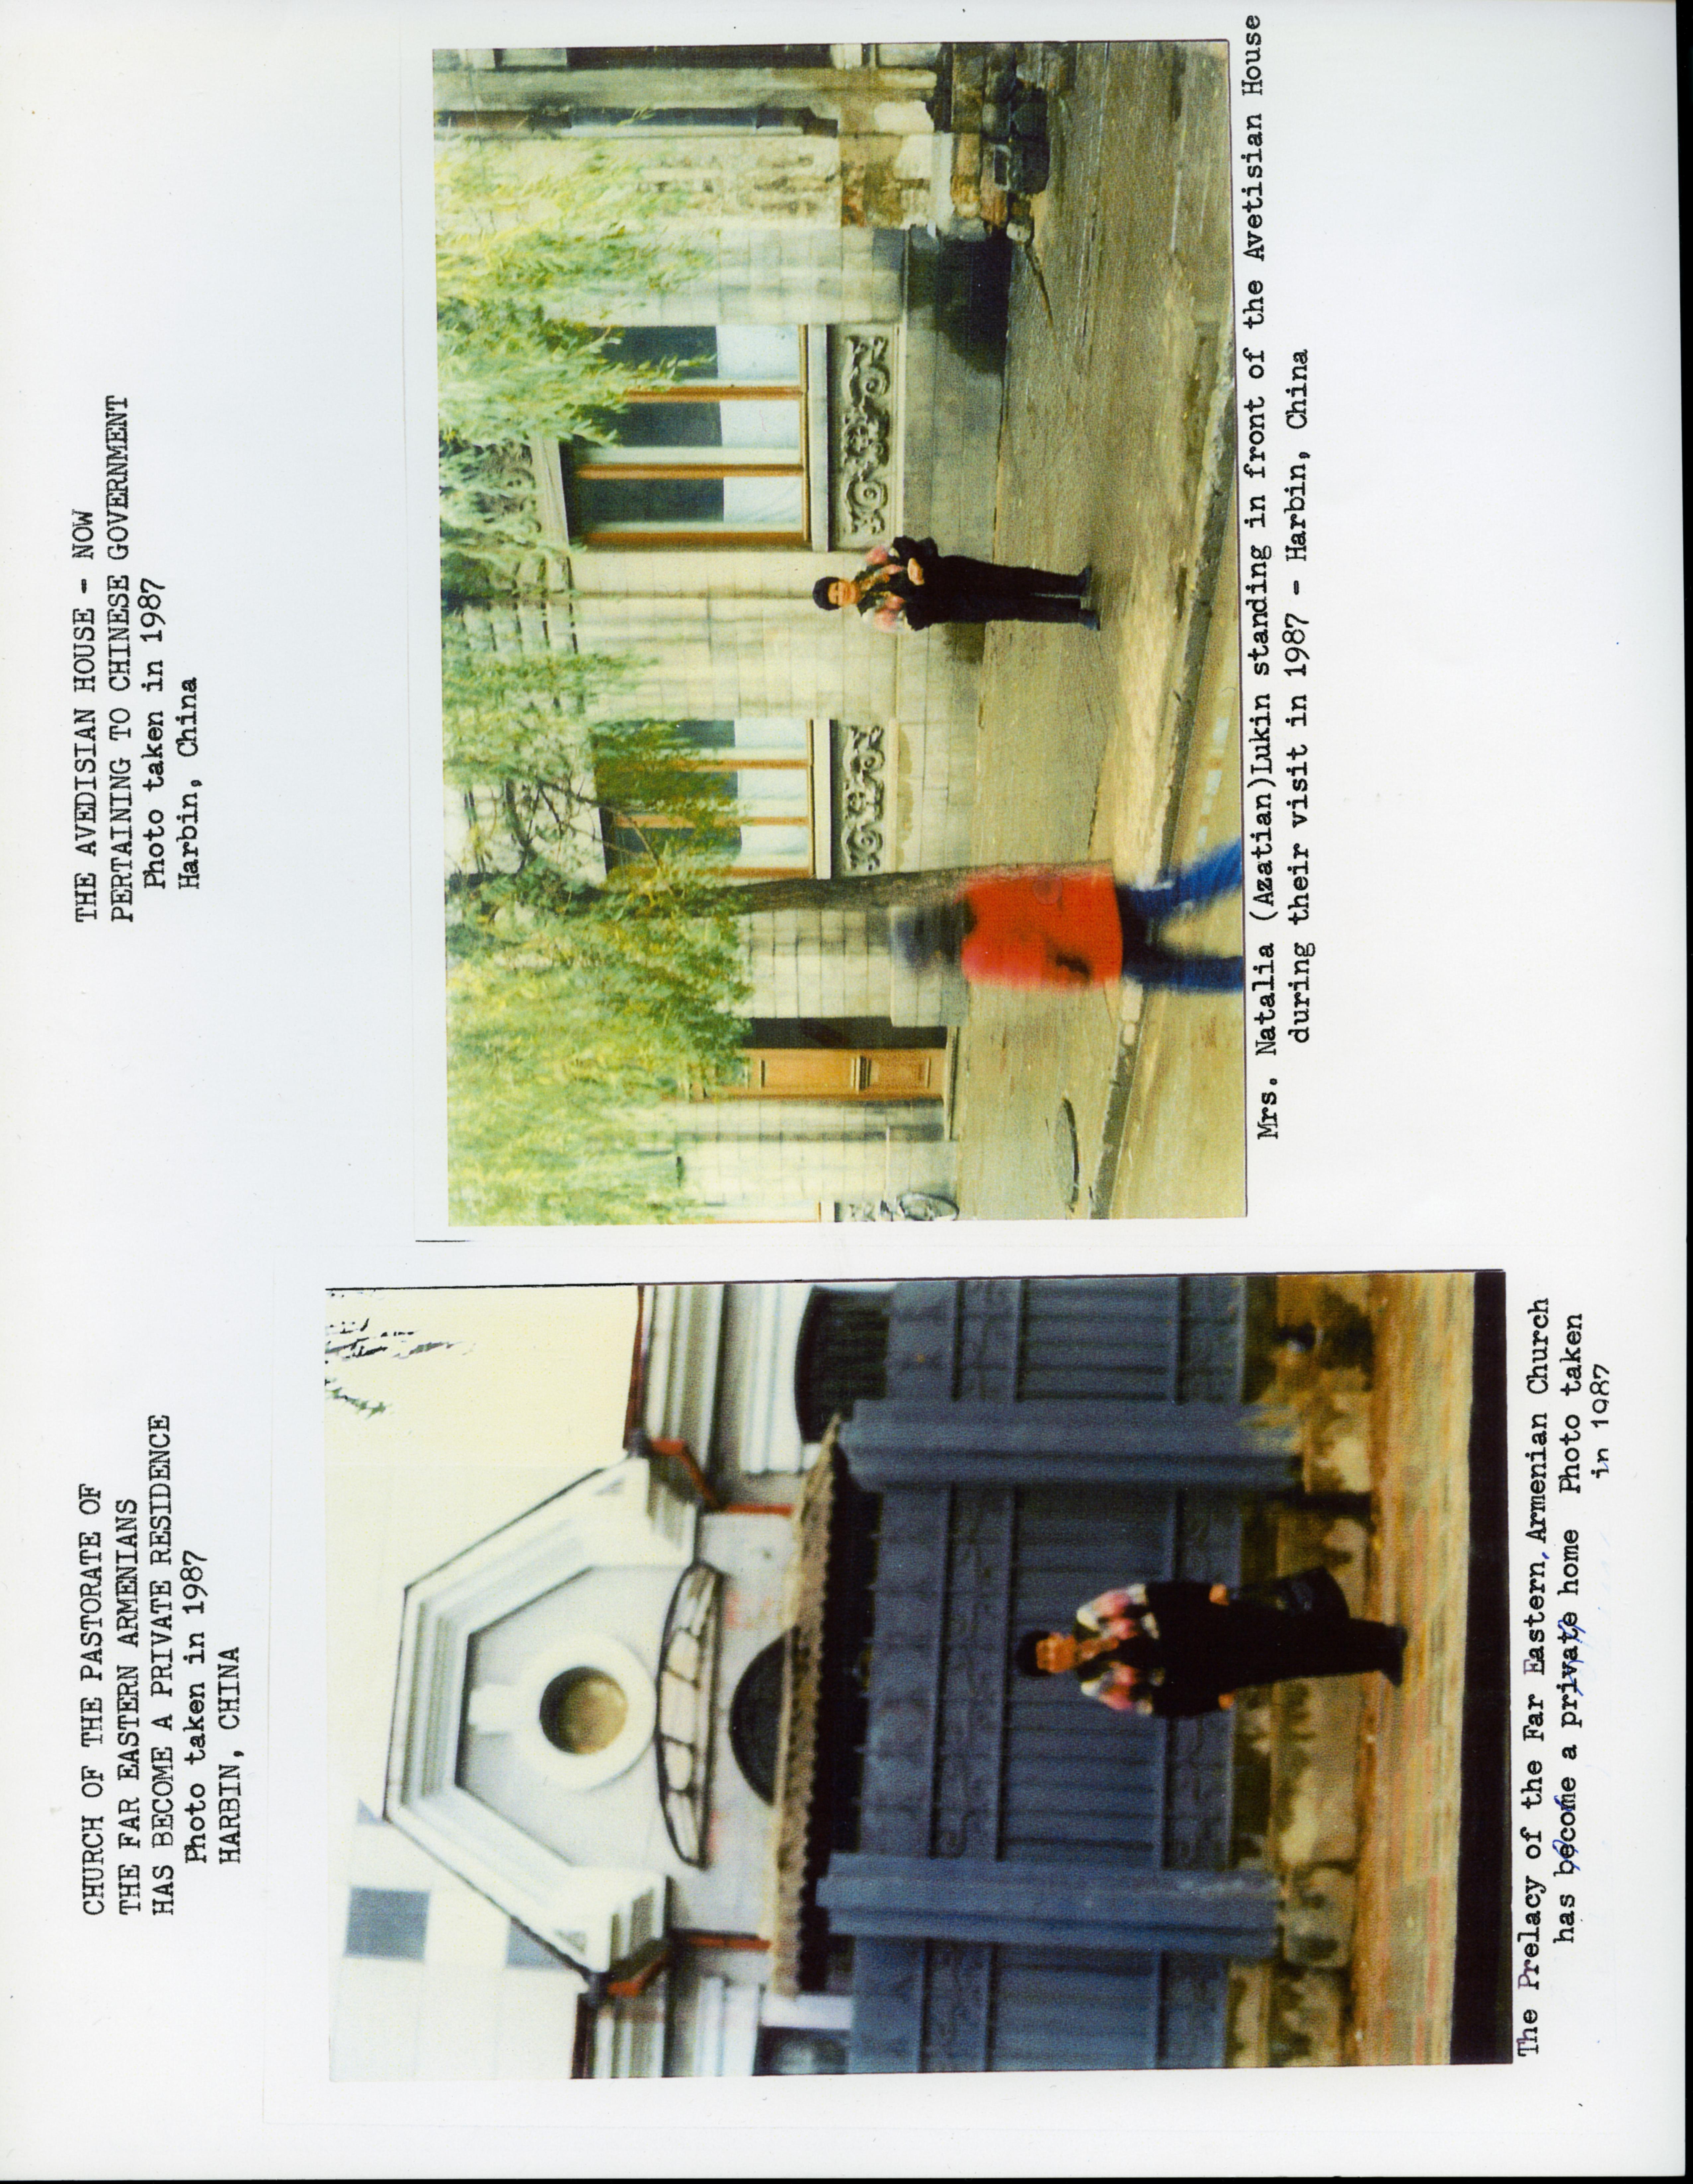 Former Armenian sites in Harbin, China, c. 1987